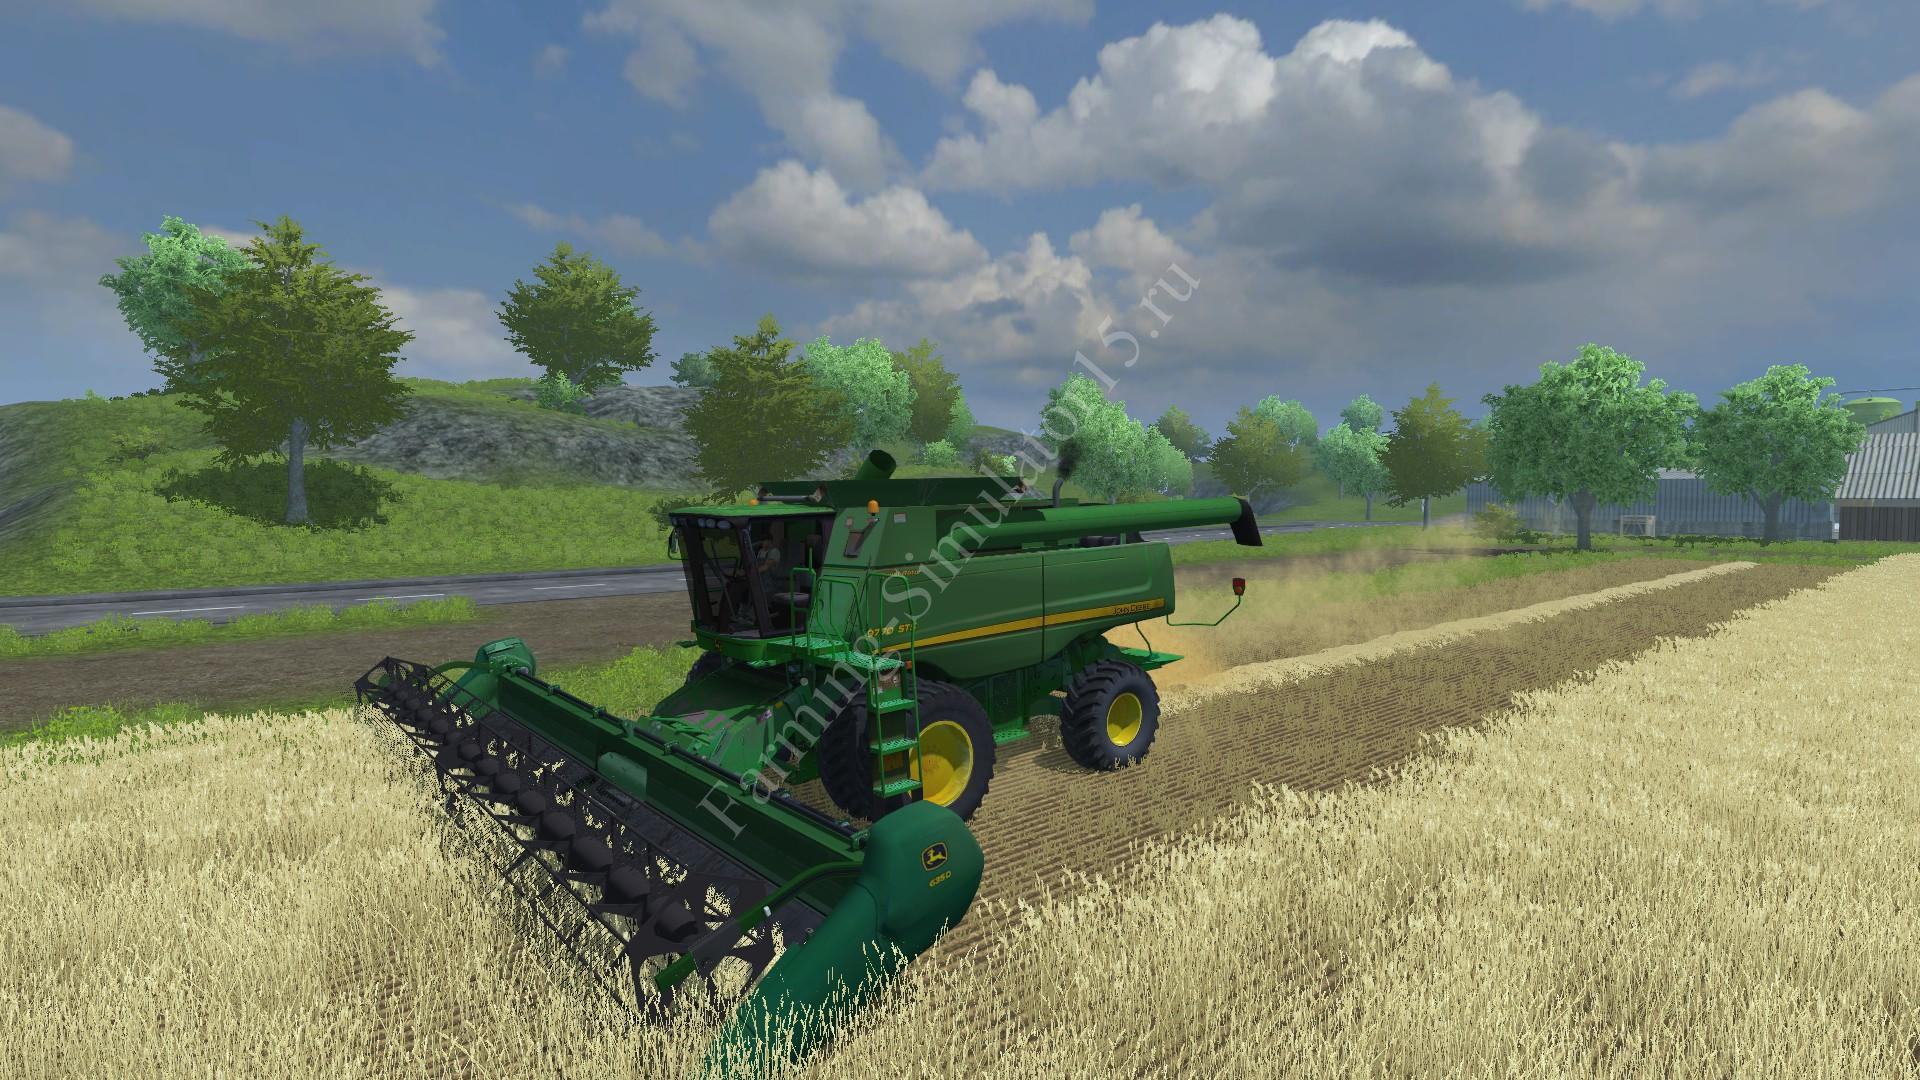 Мод комбайна John Deere 9770 STS v 2.2 Farming Simulator 2013, Farming Simulator 13